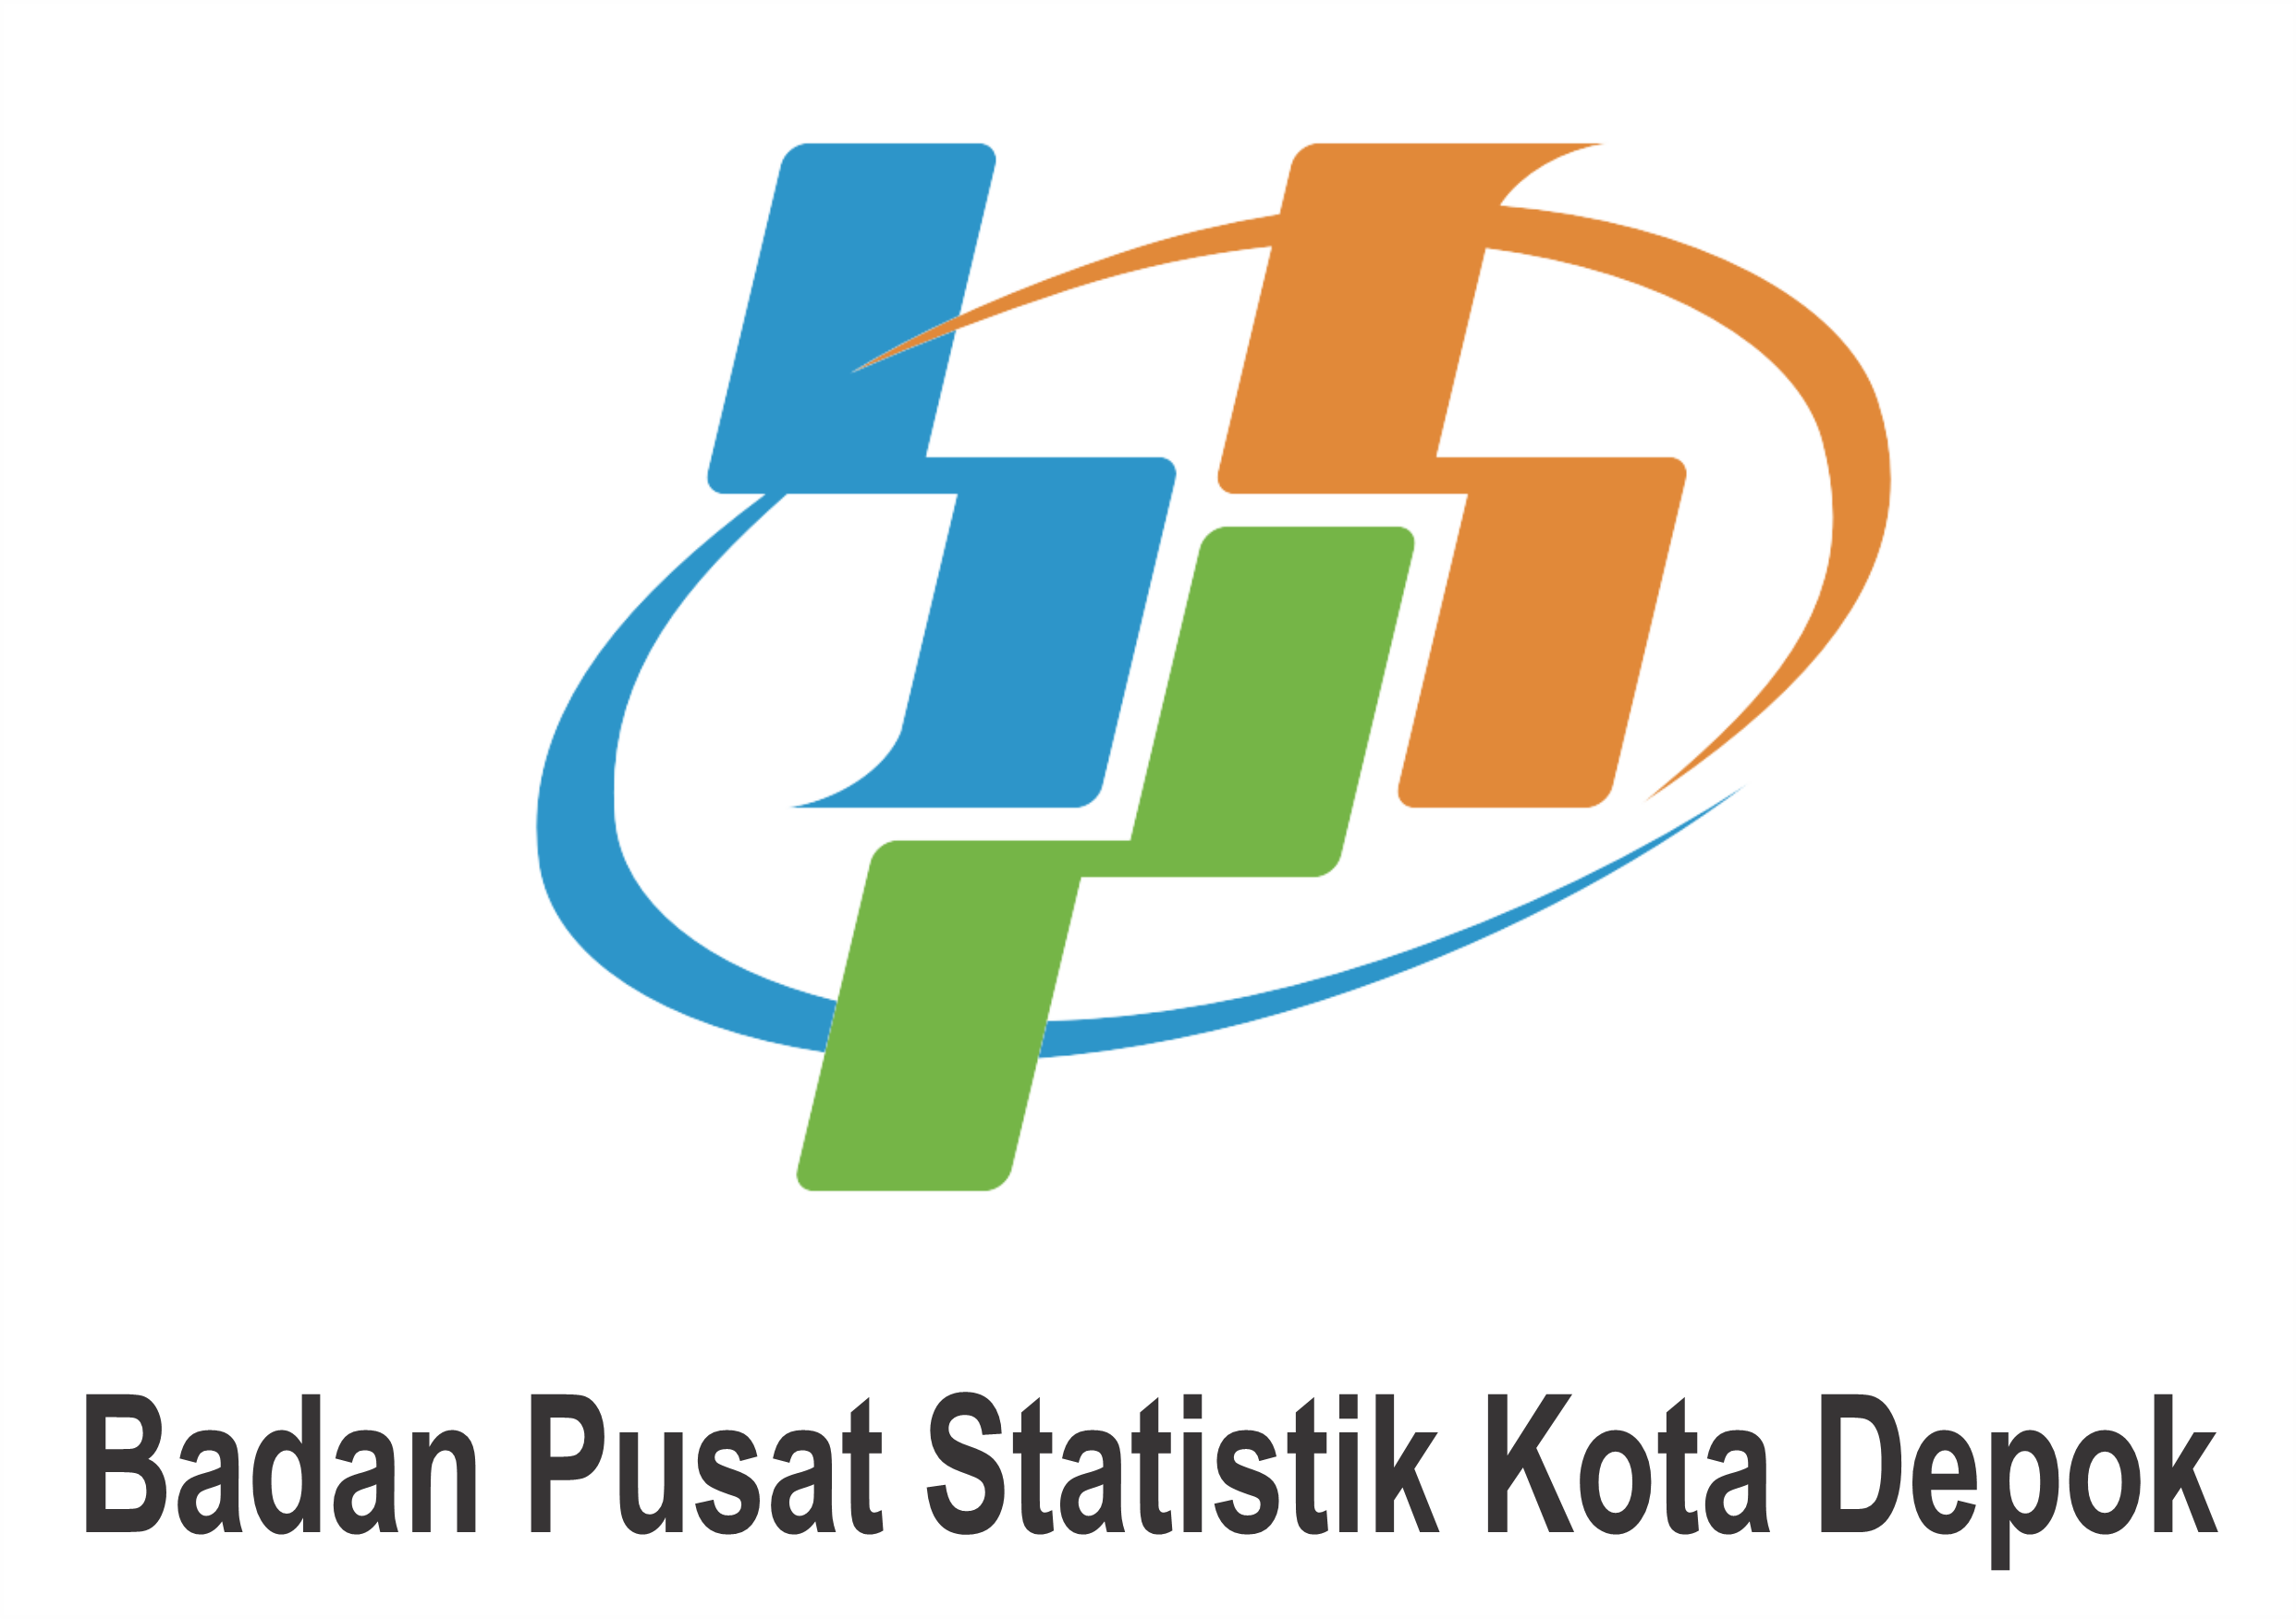 Badan Pusat Statistik Kota Depok